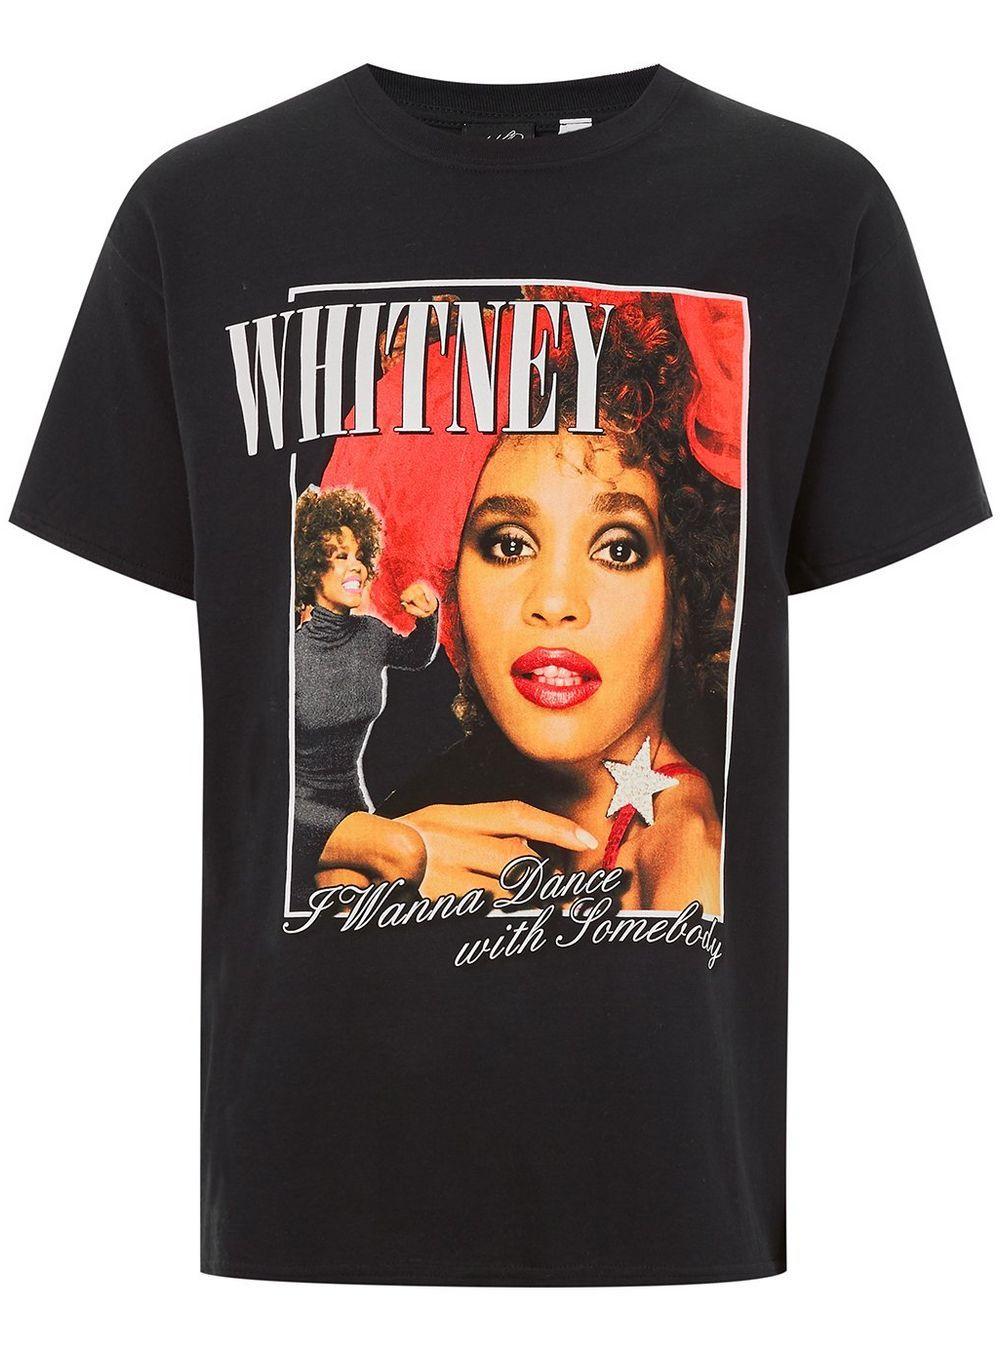 372c20000d0 Black Whitney Houston T-Shirt - TOPMAN USA